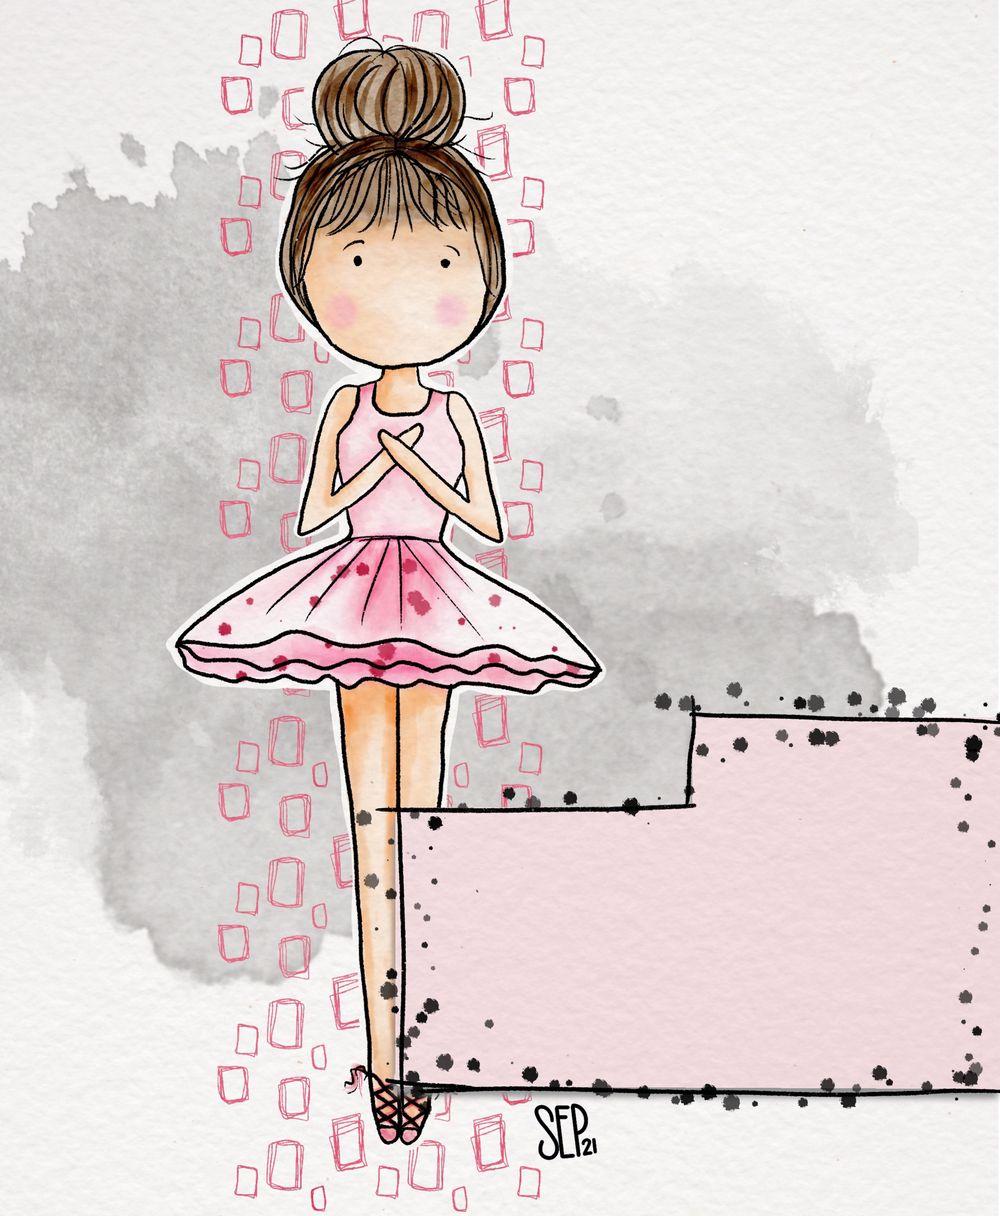 My ballerina - image 2 - student project